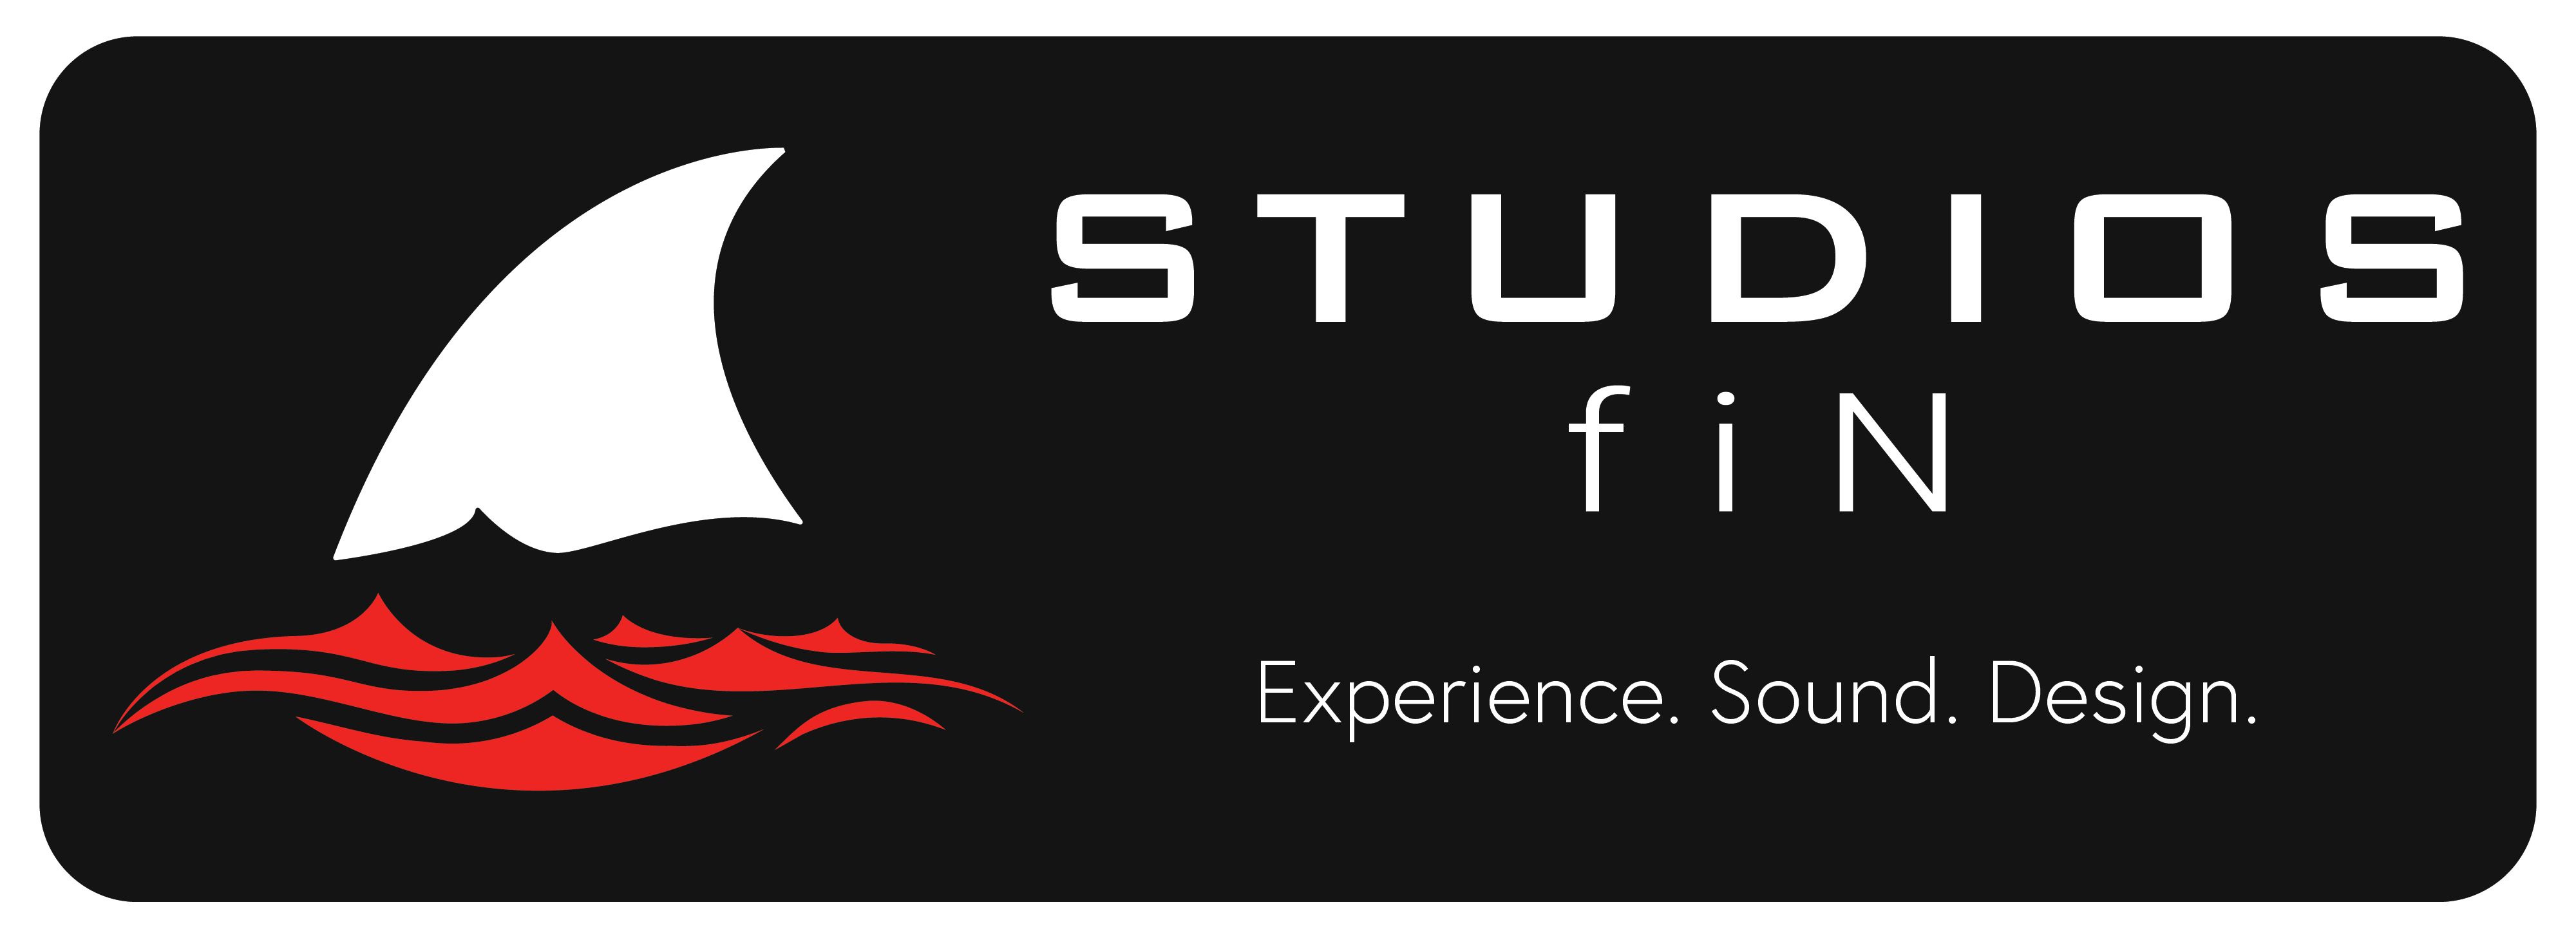 fiN Studios